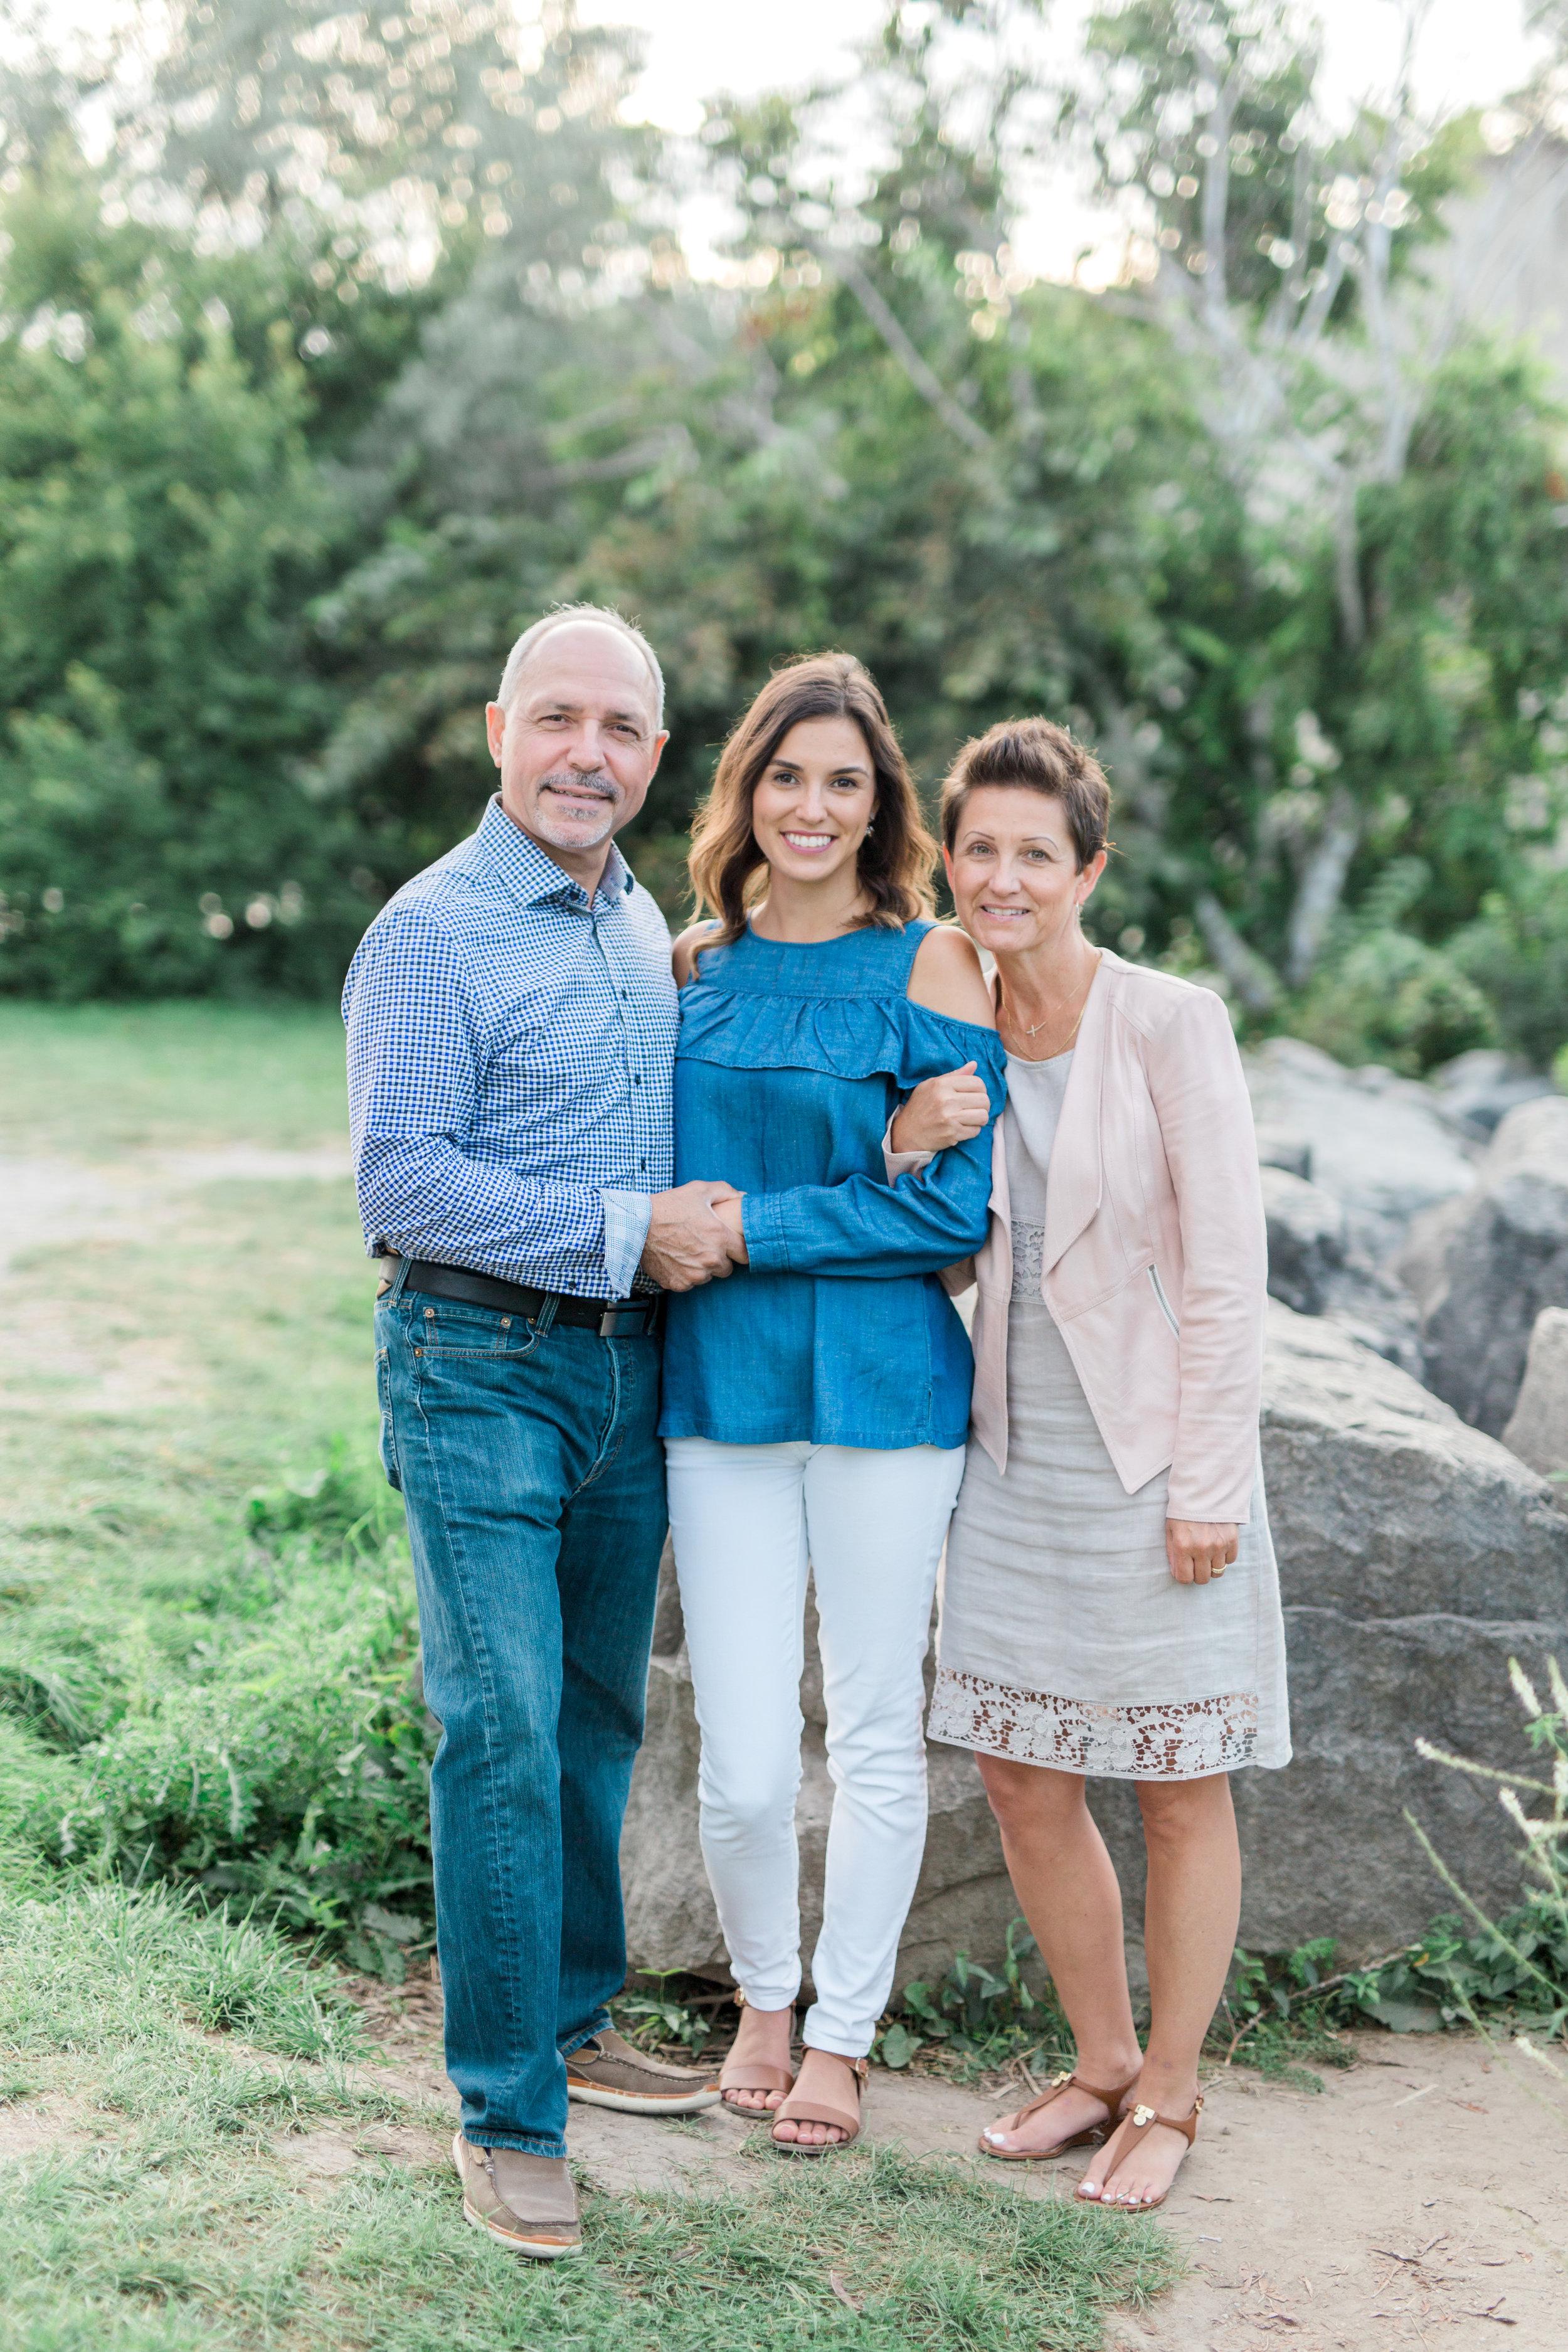 Danielle-Giroux-Amir-Golbazi-Genua-Family-Photography-Scarborough-Bluffs-9097.jpg